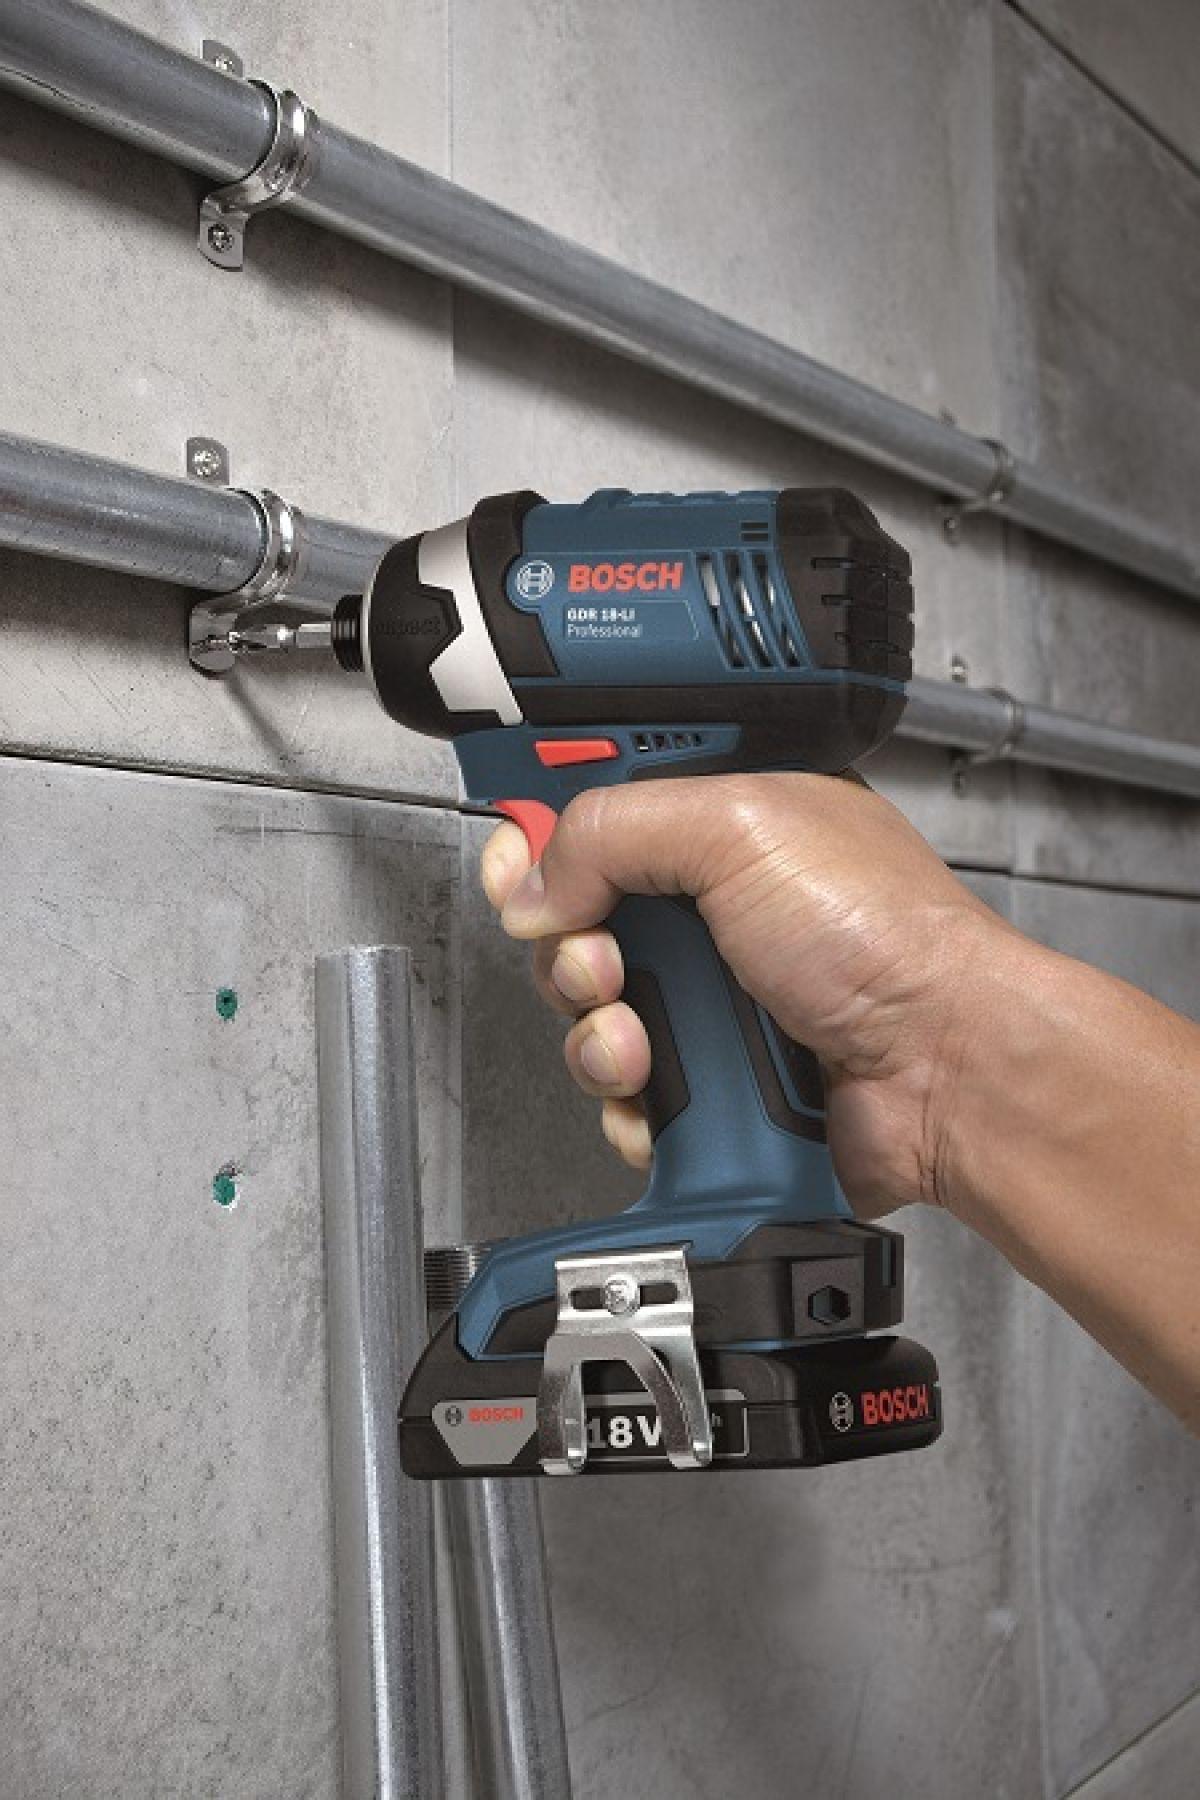 Bosch Impact Driver In Use Organizacao Da Garagem Ferramentas Garagem